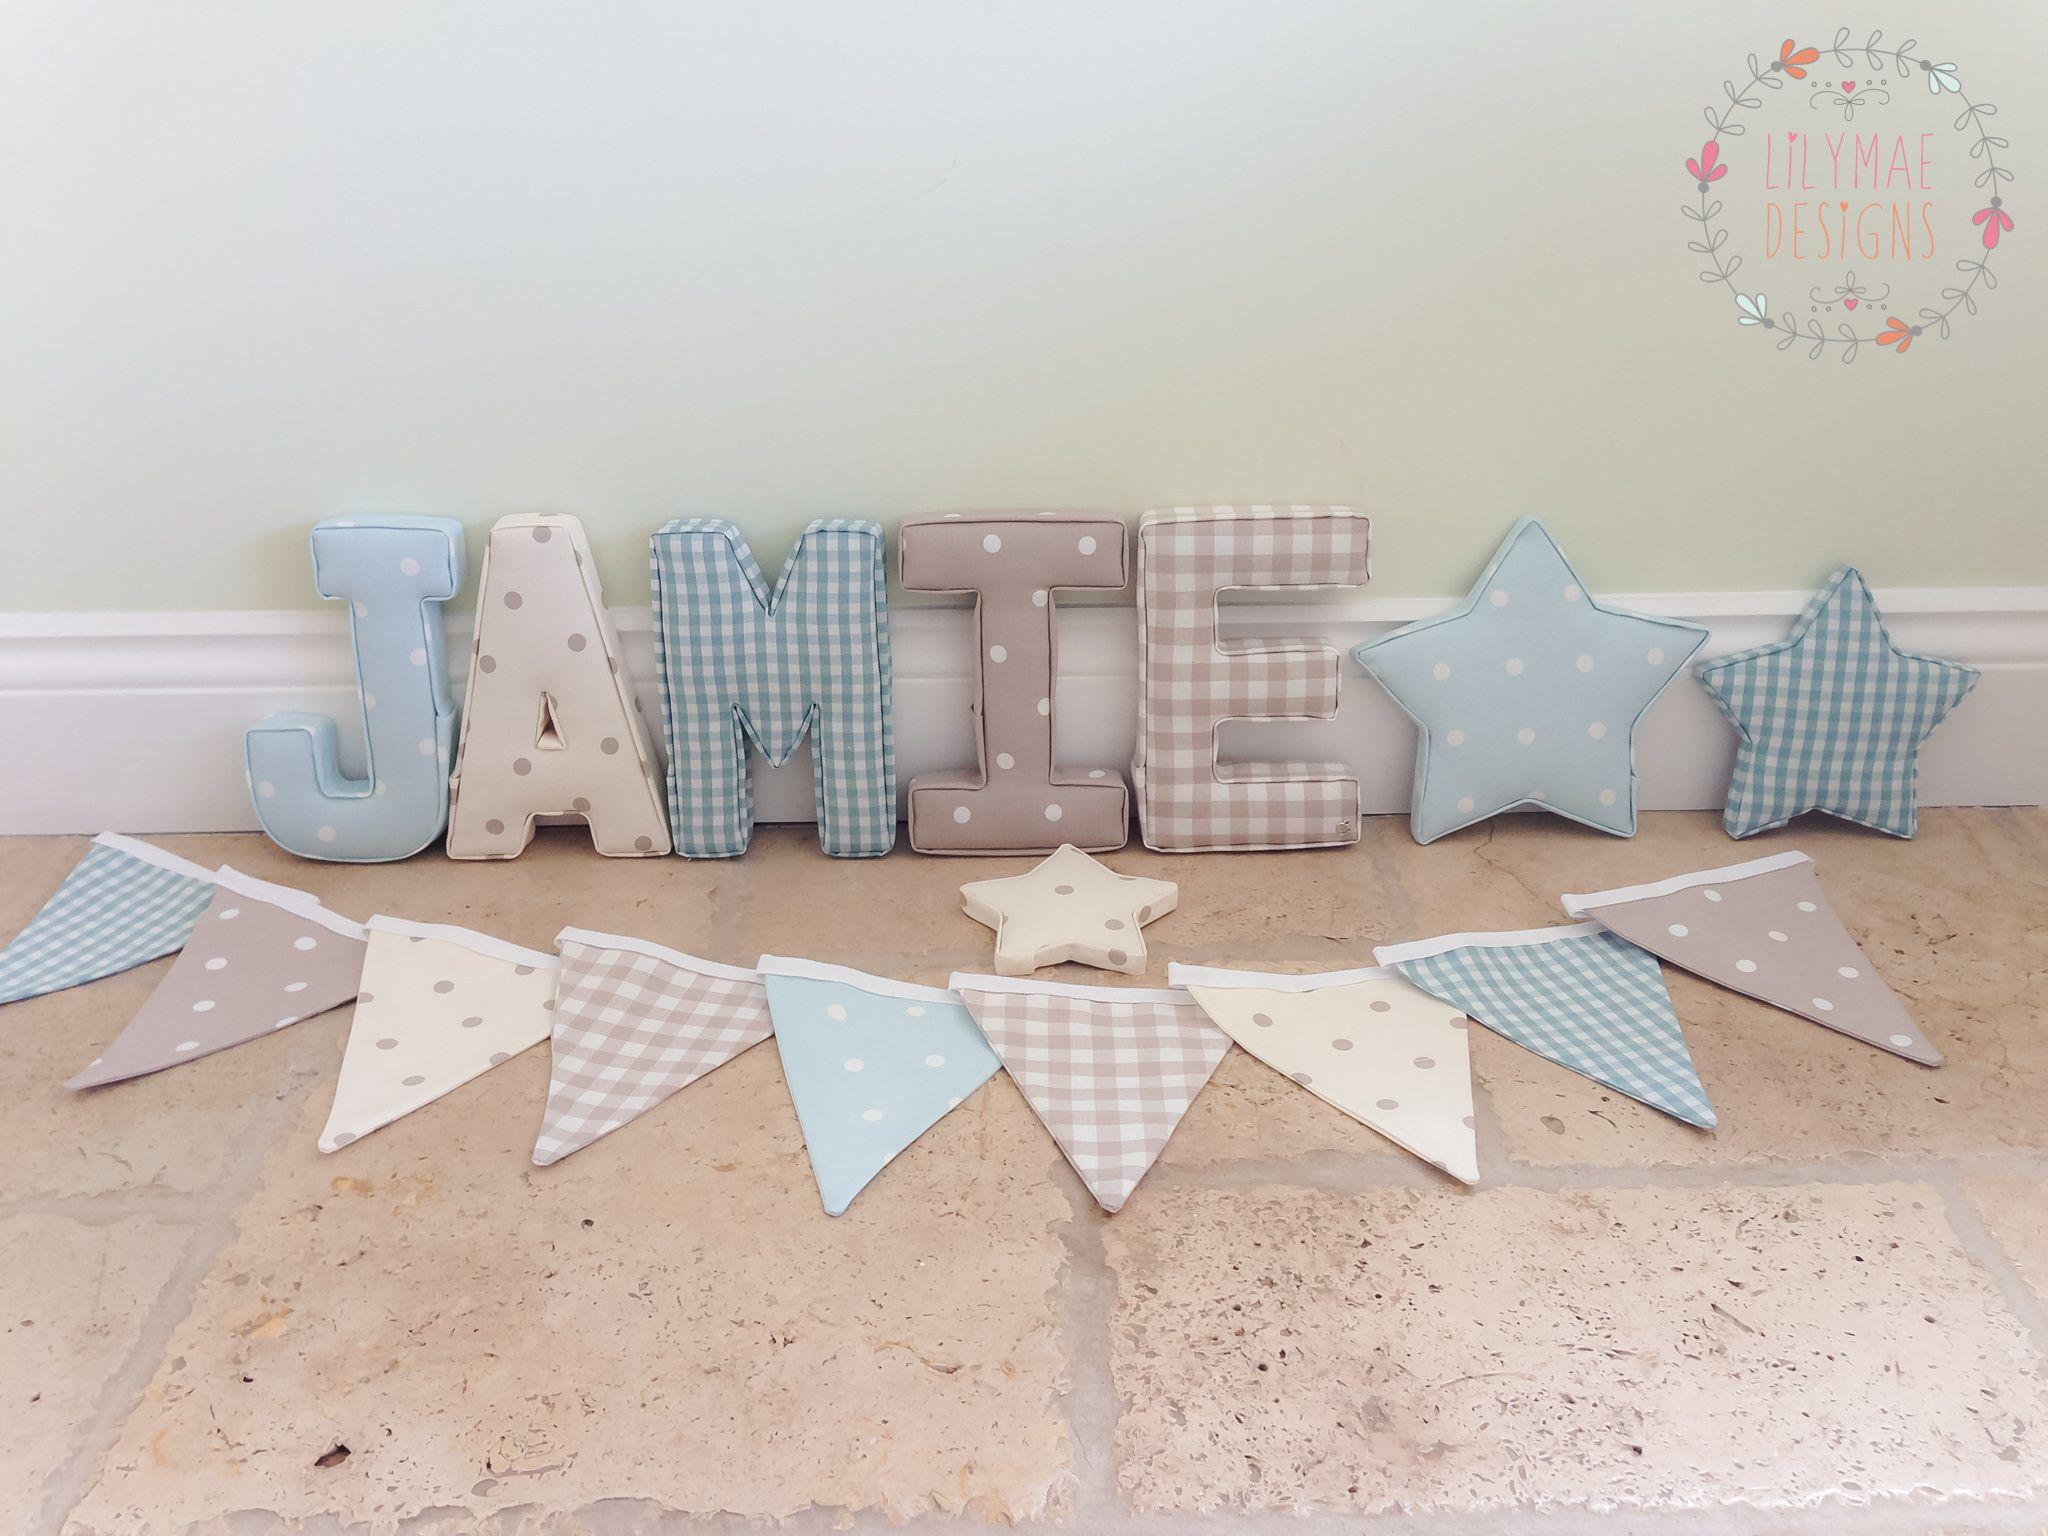 Fabric Star Sets Lilymae Designs Home Decor Nursery Wall